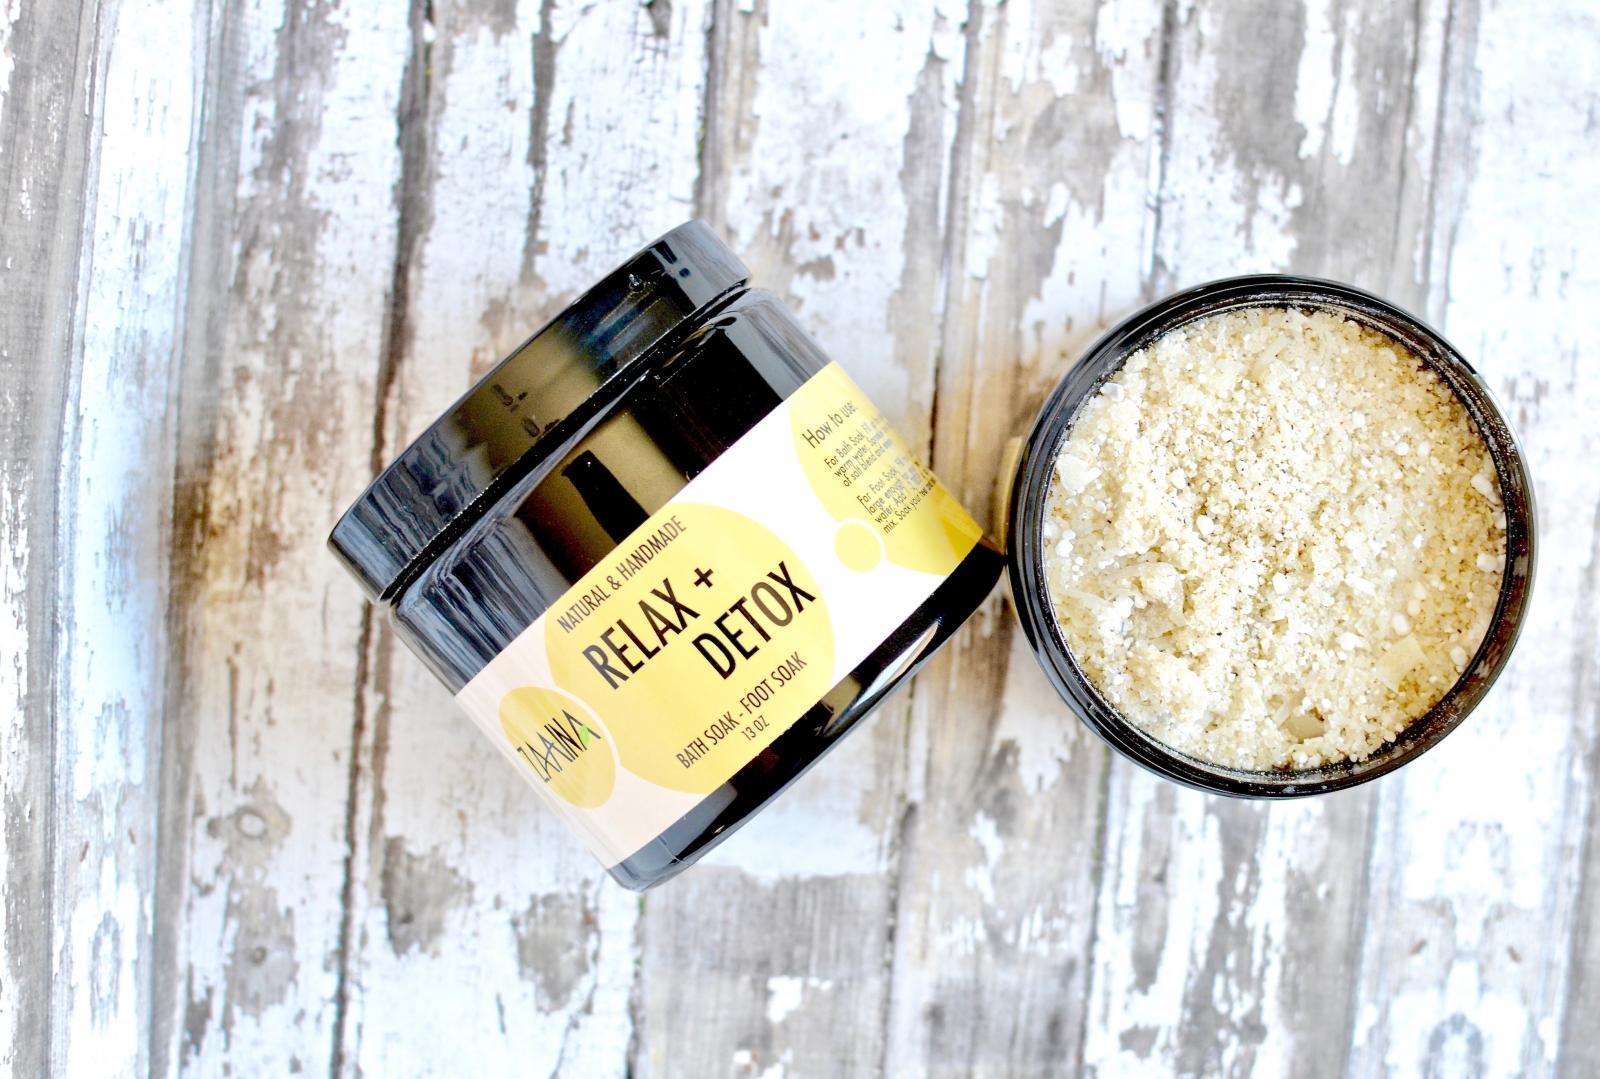 Relax & Detox Bath Salts